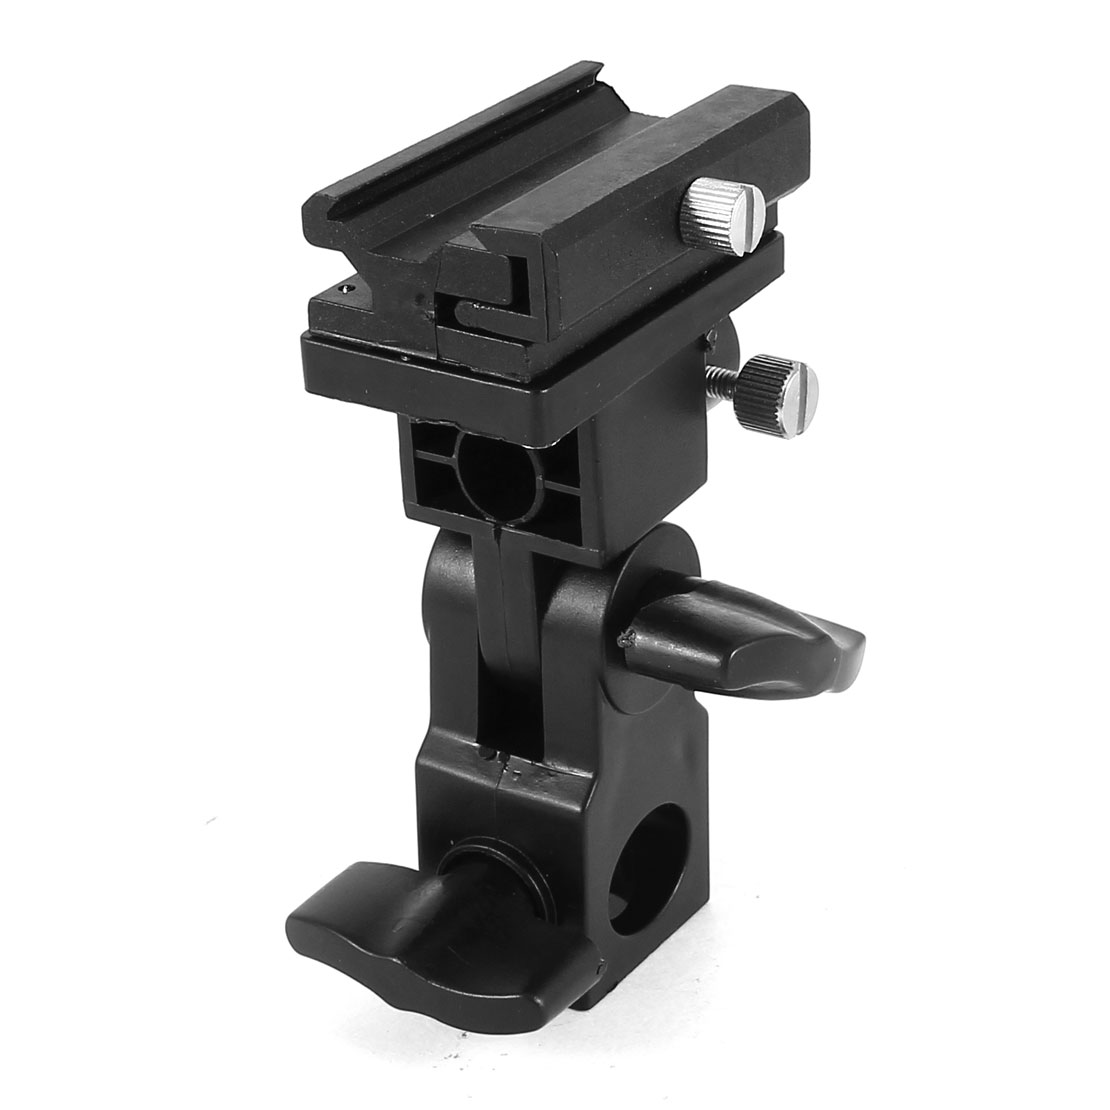 Flash Hot Shoe Mount Adapter Studio Umbrella Holder Swivel Light Stand Bracket